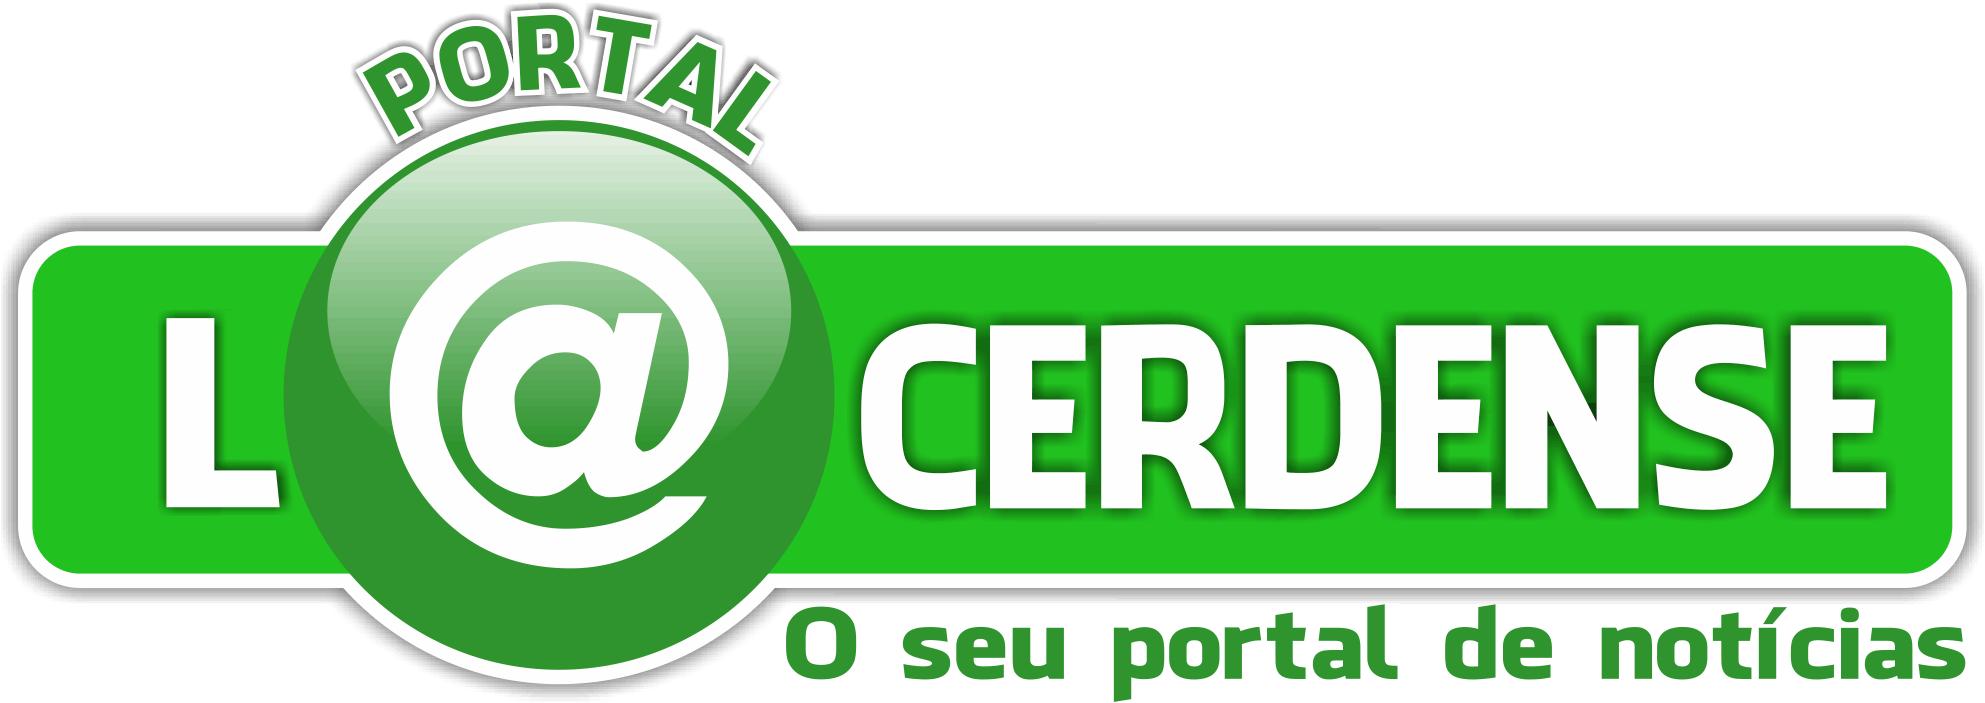 http://1780.go7.pro.br/conteudo/id-678801/mauro_mendes_decide_disputar_o_governo_e_se_distancia_de_taques